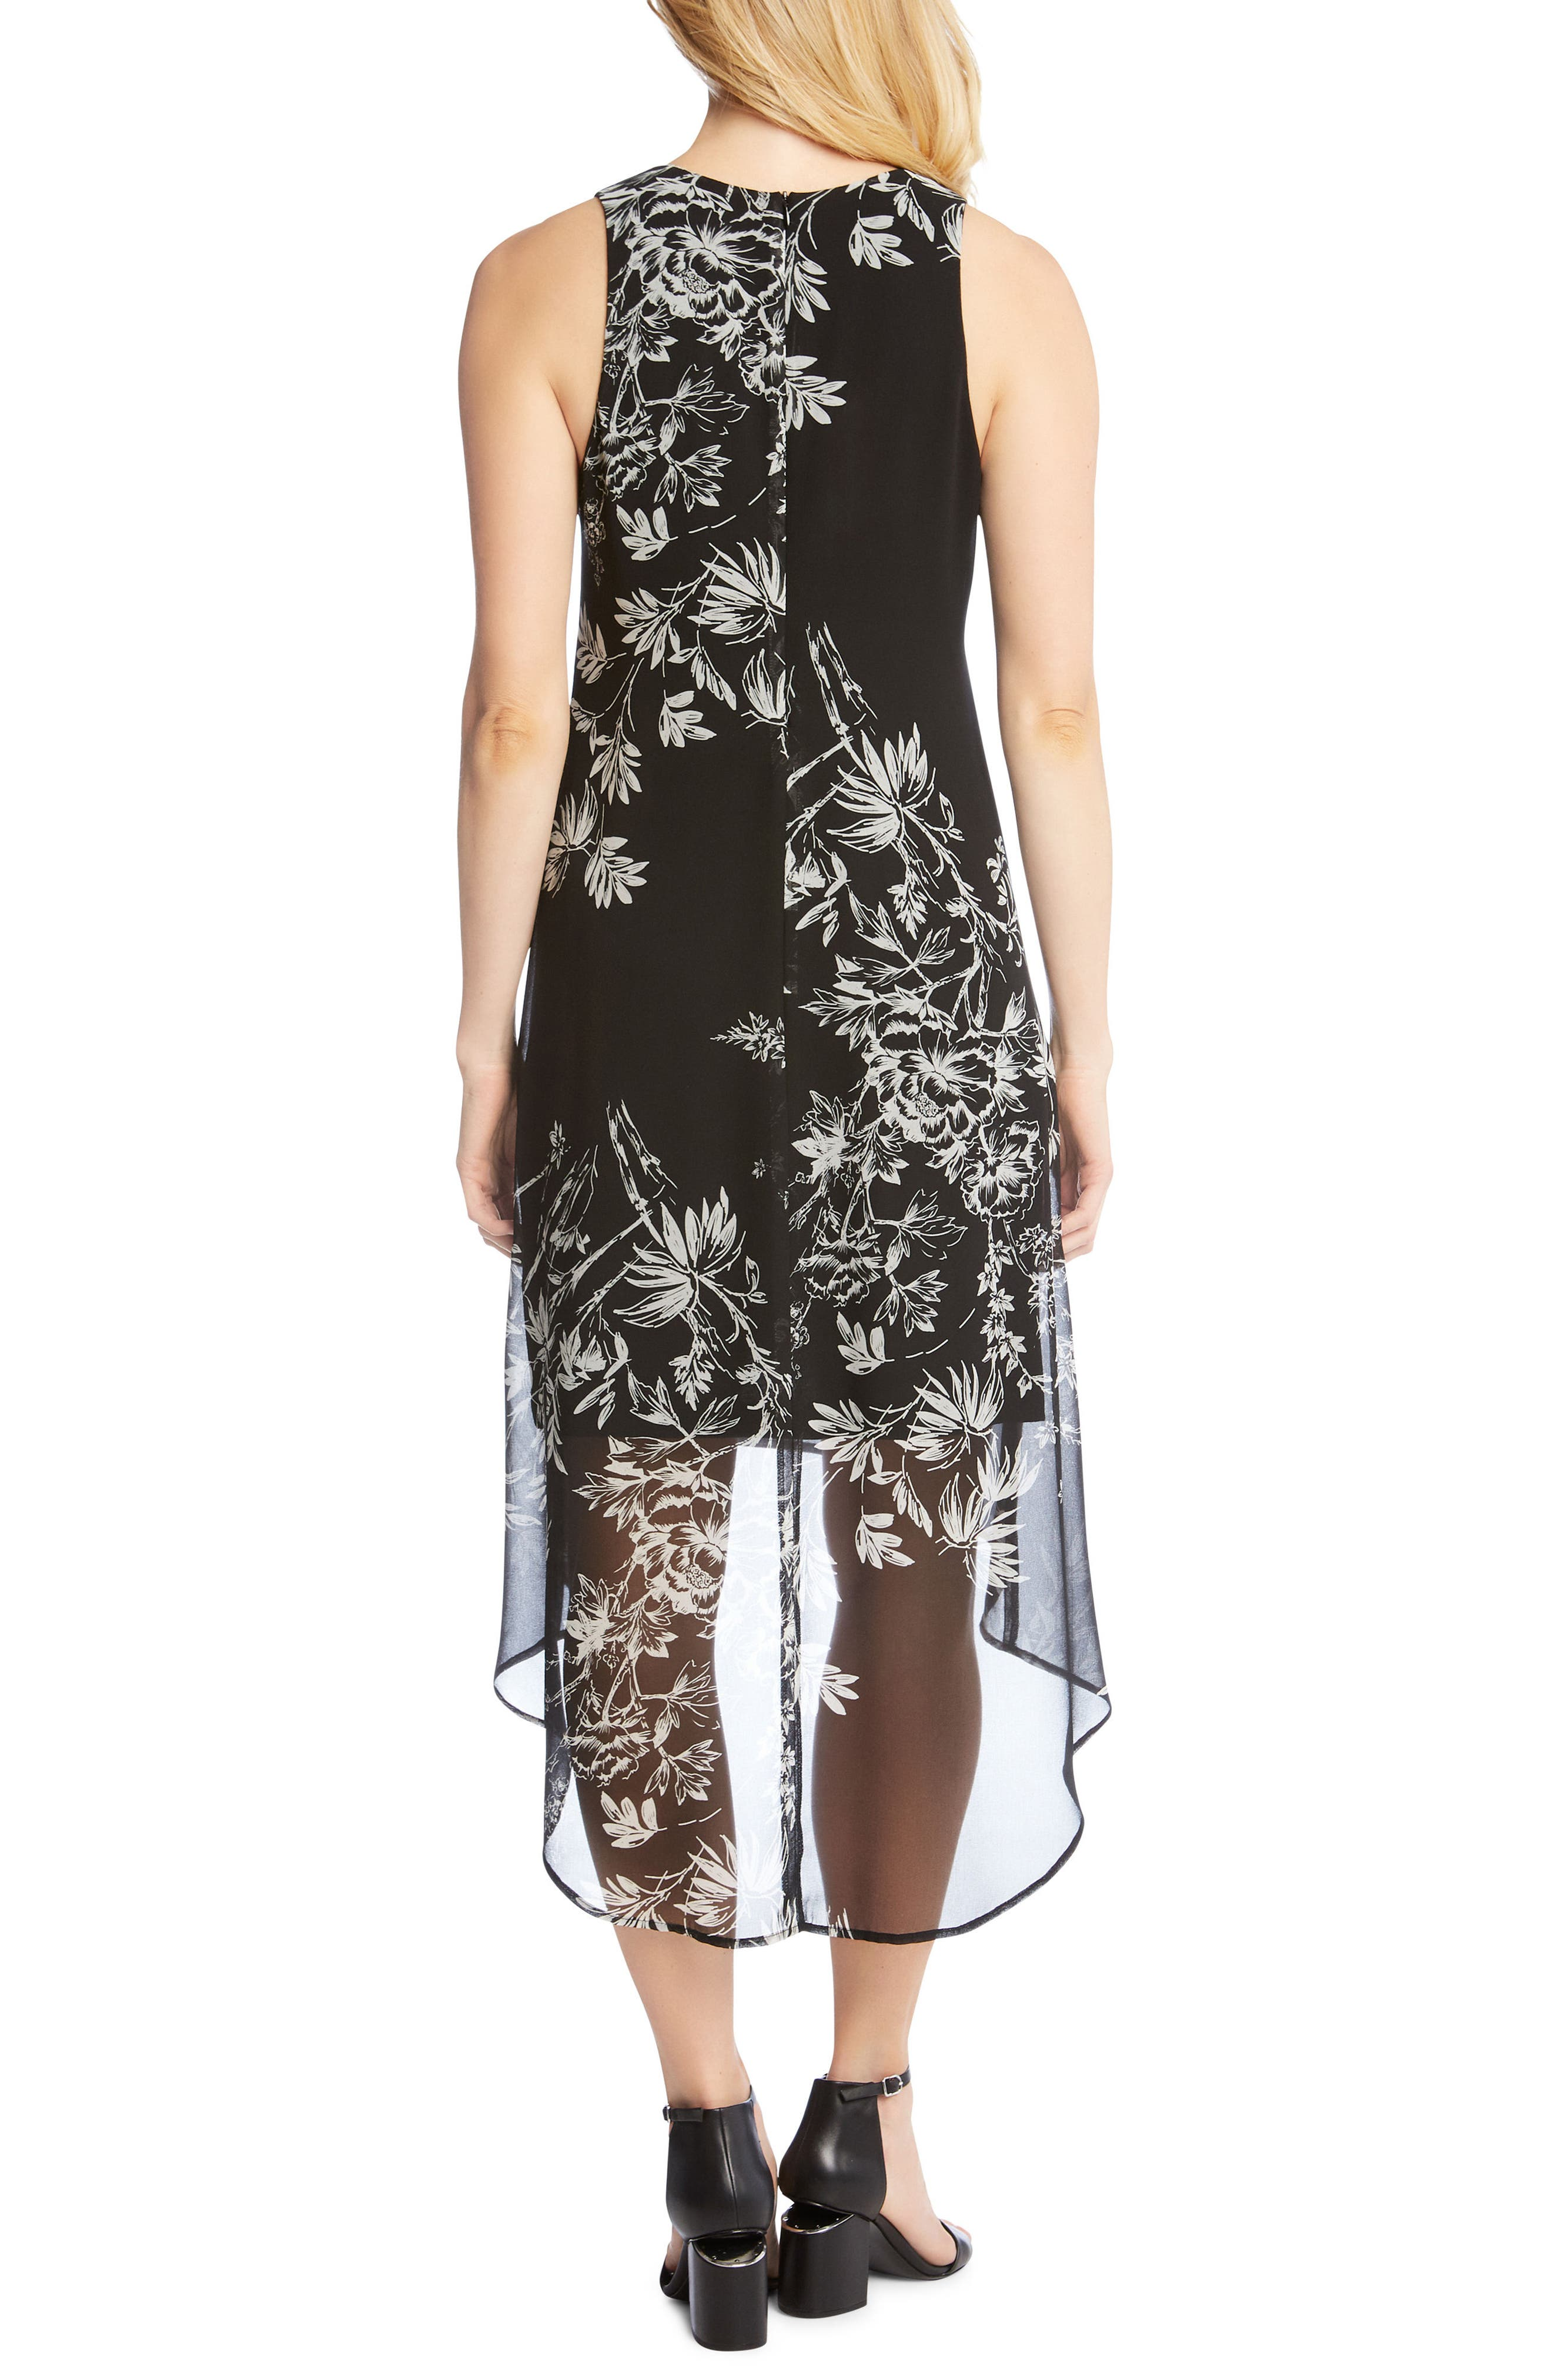 Sketched Floral Dress,                             Alternate thumbnail 2, color,                             Print